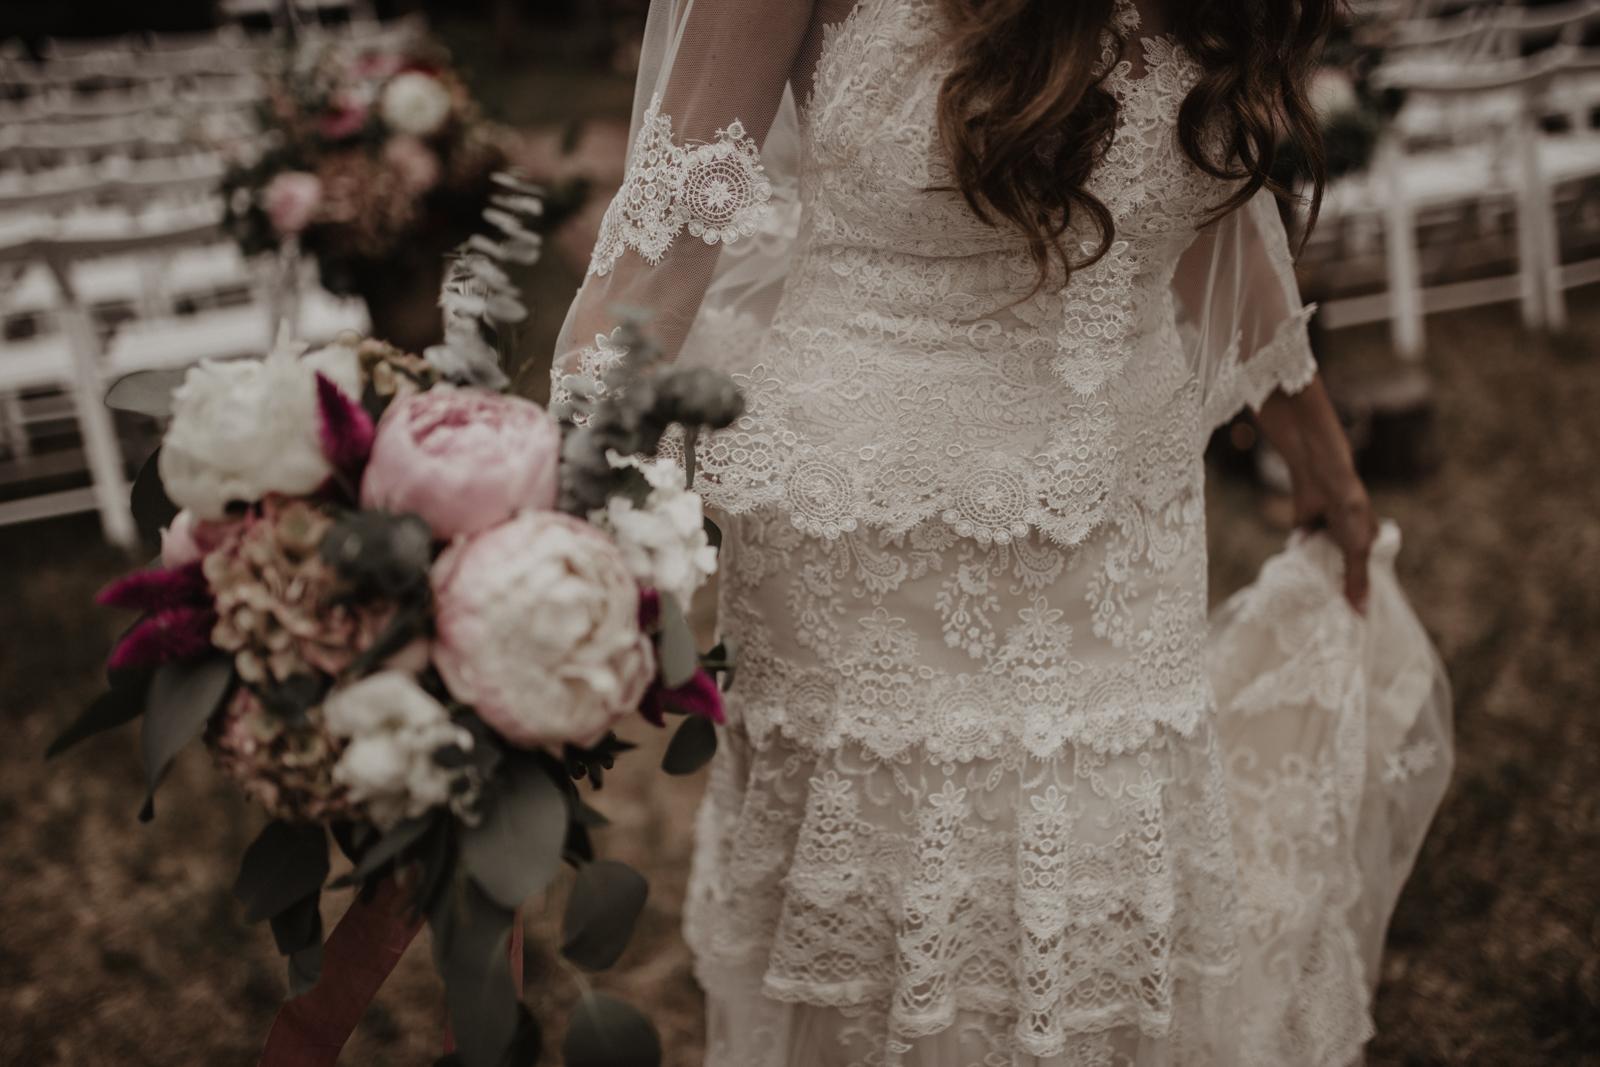 thenortherngirlphotography_photography_thenortherngirl_rebeccascabros_wedding_weddingphotography_weddingphotographer_barcelona_bodaenbarcelona_bodaenmaselmarti_bodarogeryvane-535.jpg